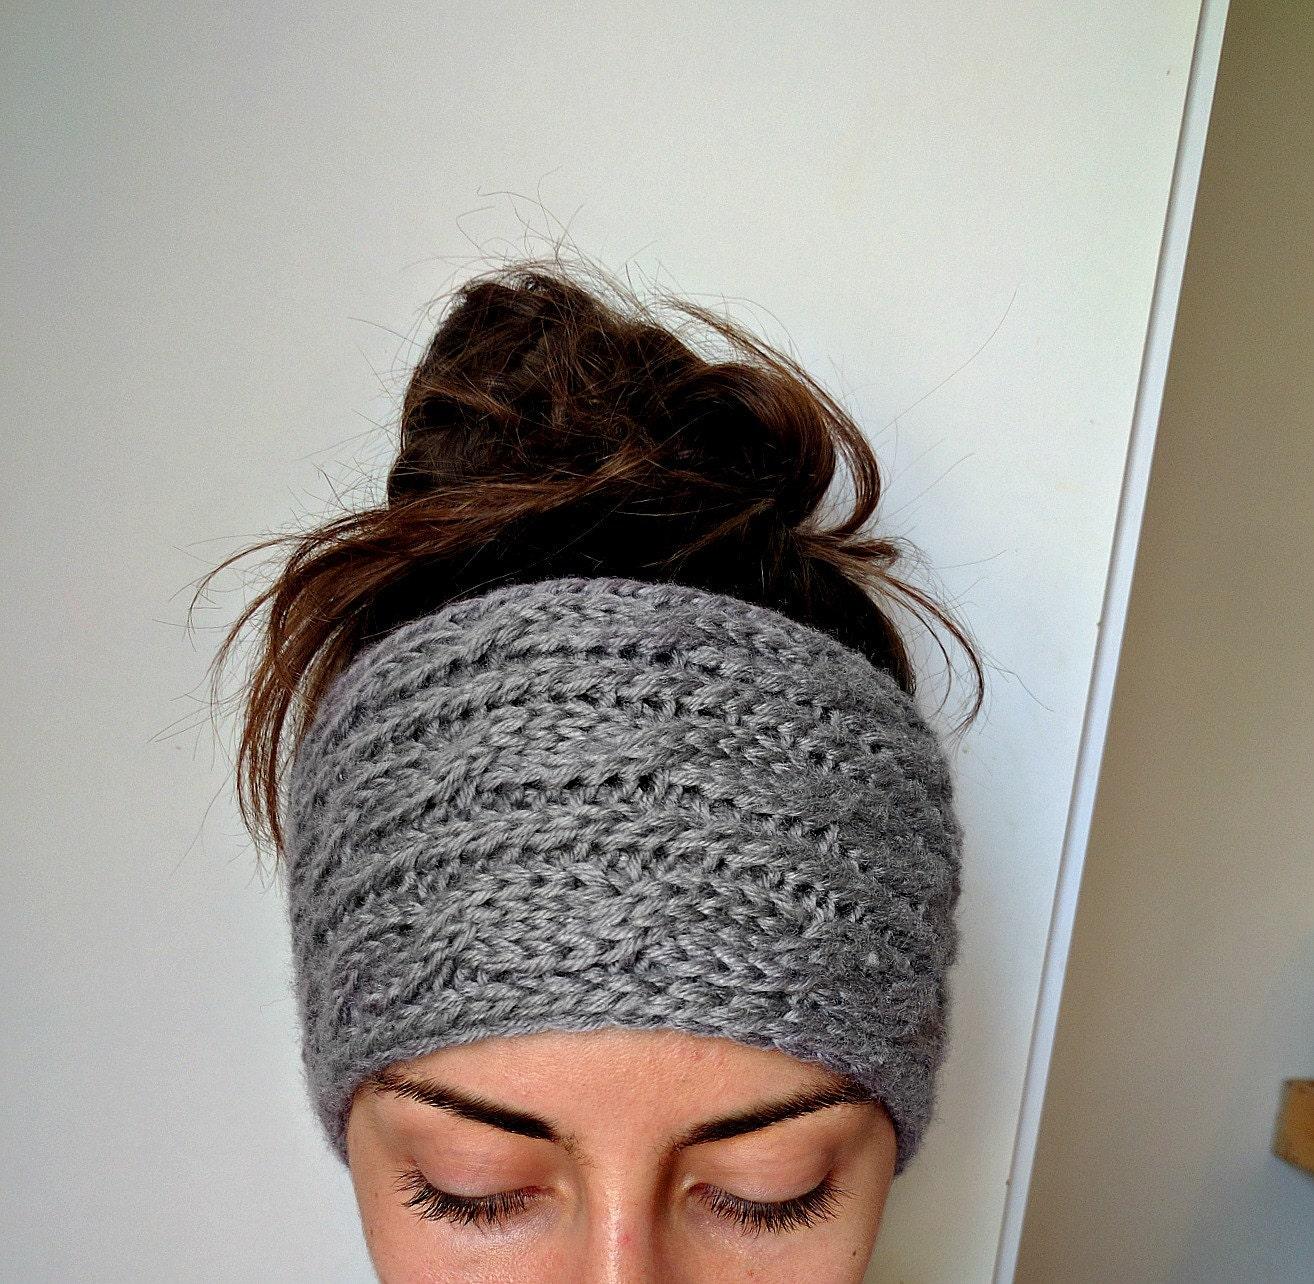 Chunky Cable Knit Ear Warmer Thick Knit Headband Ear Warmer